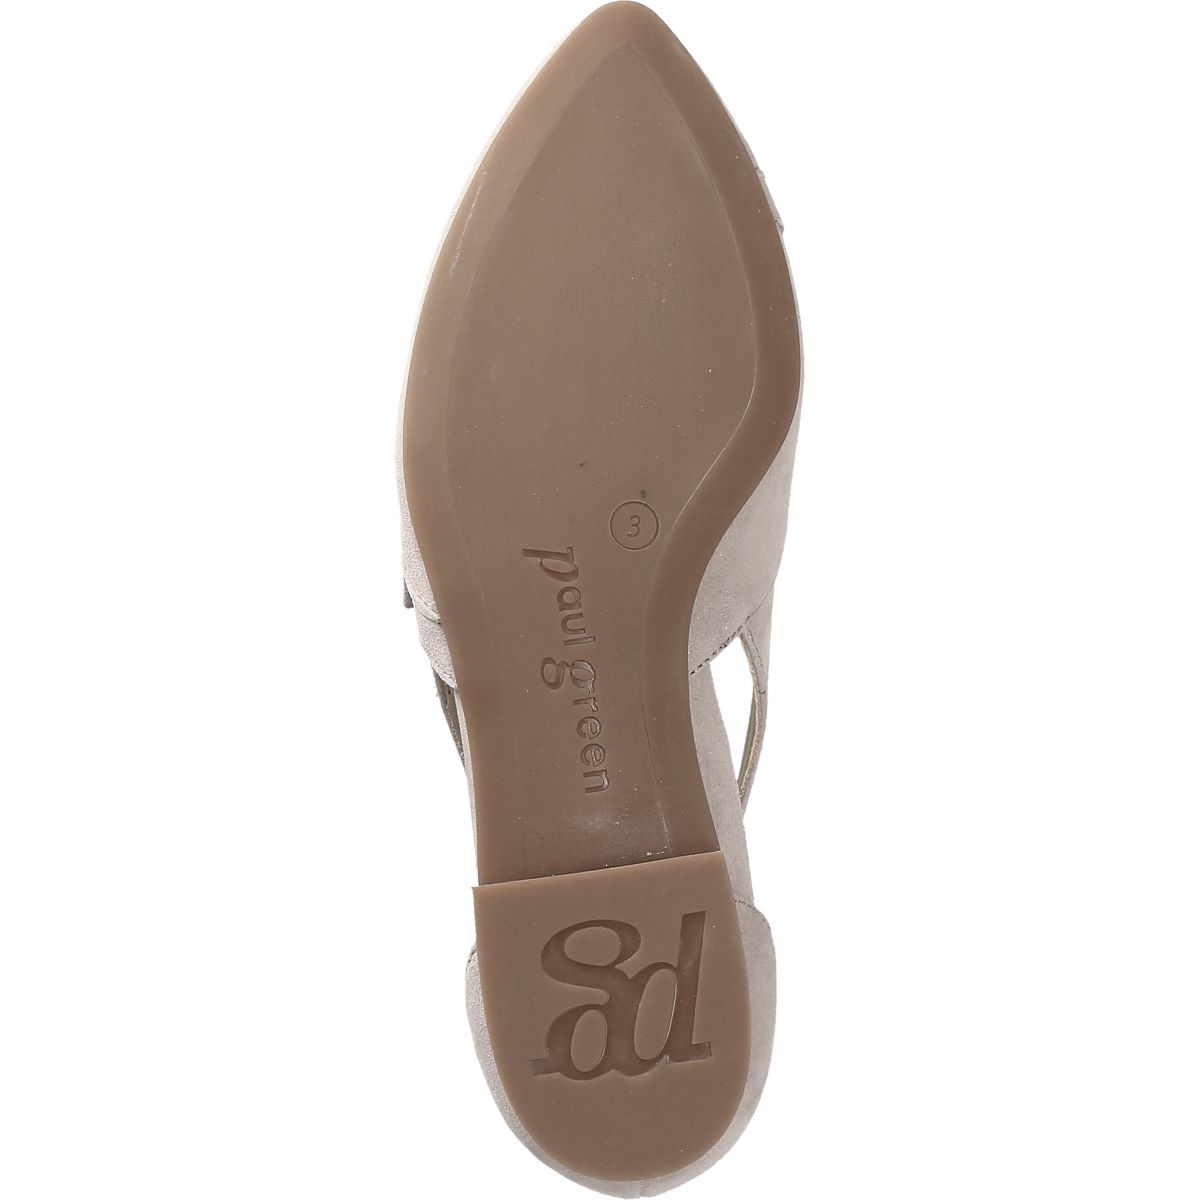 Paul Green 2313 002 Damenschuhe Ballerina im Schuhe Lüke